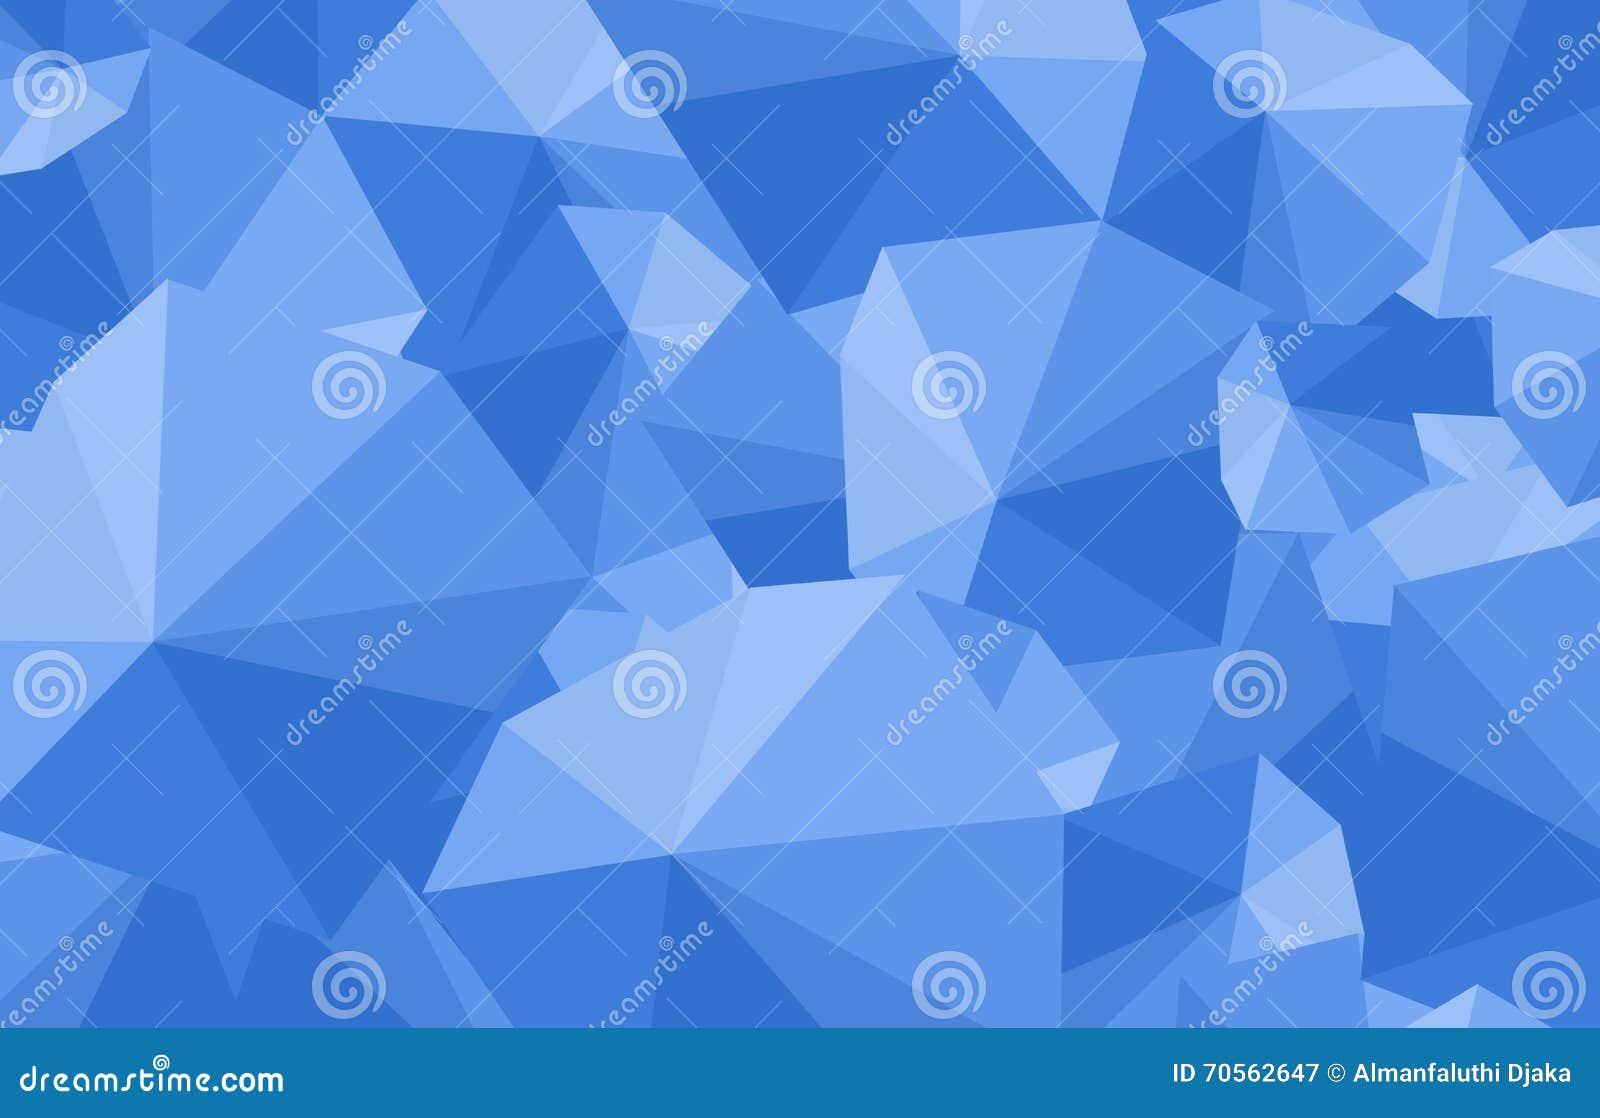 Polygonal Blue Umbrella Art Background